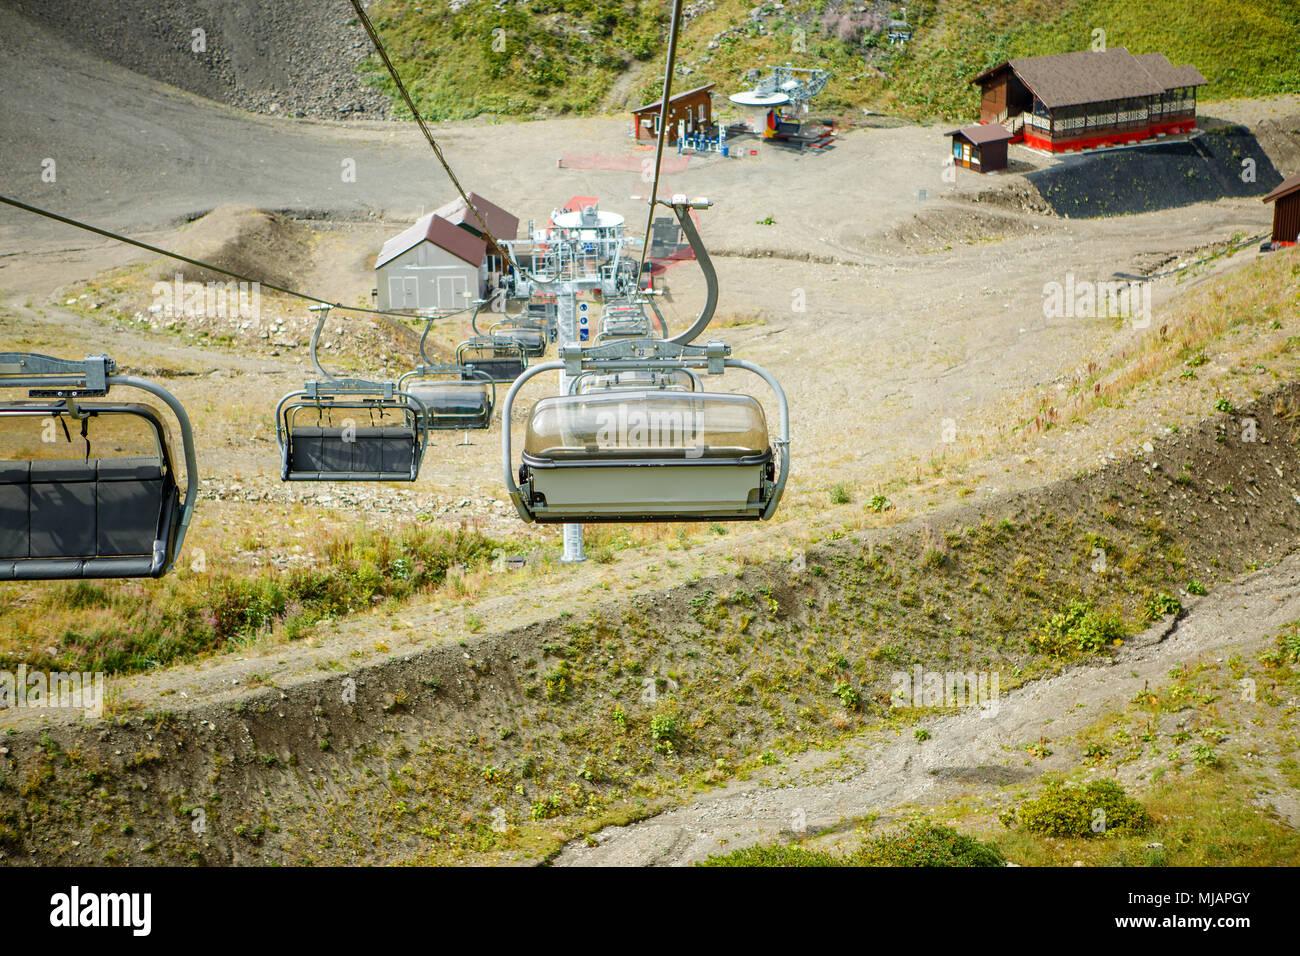 Image of funicular at mountainside - Stock Image